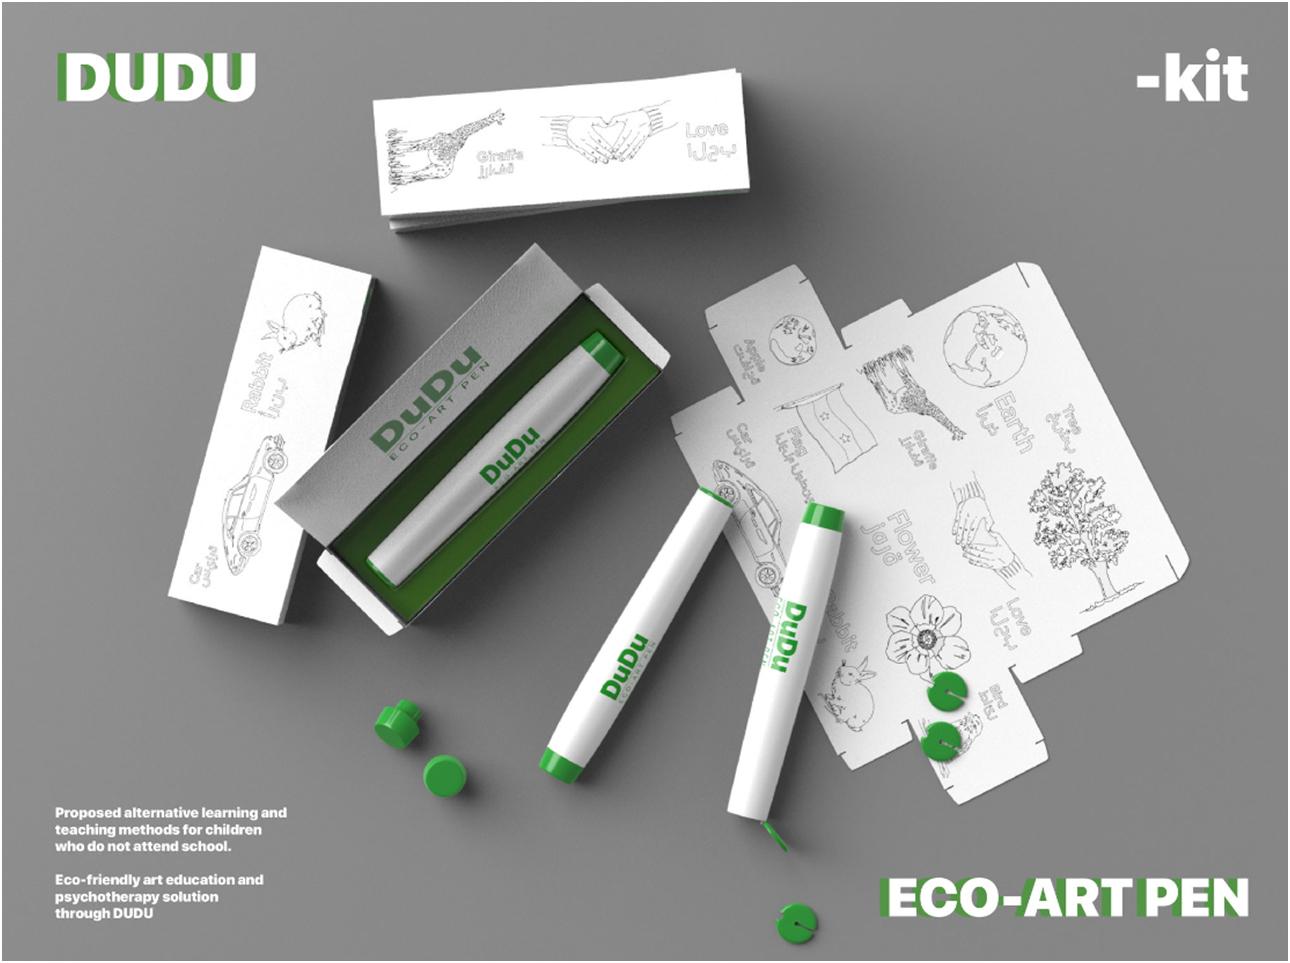 Dudu Kit, iF Design Talent Award 2020 수상 첨부 이미지 -  iF Design Talent Award 2020 수상작 - XD 학과 2학년 오승빈 학생의 작품 'Dudu Kit'